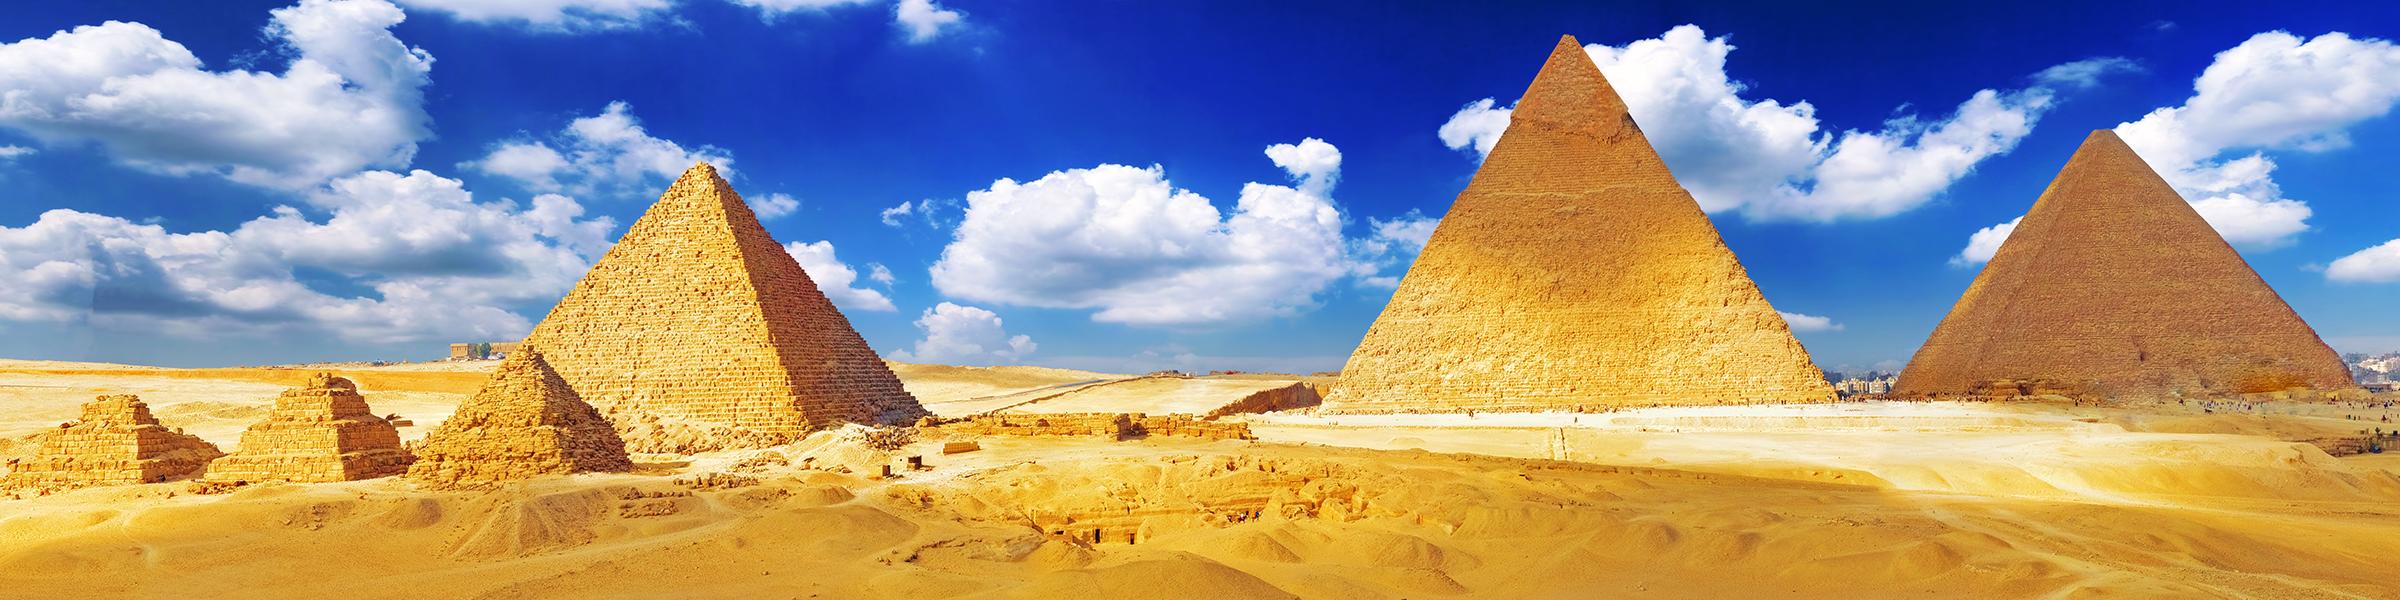 Egypt Great Pyramid of Giza